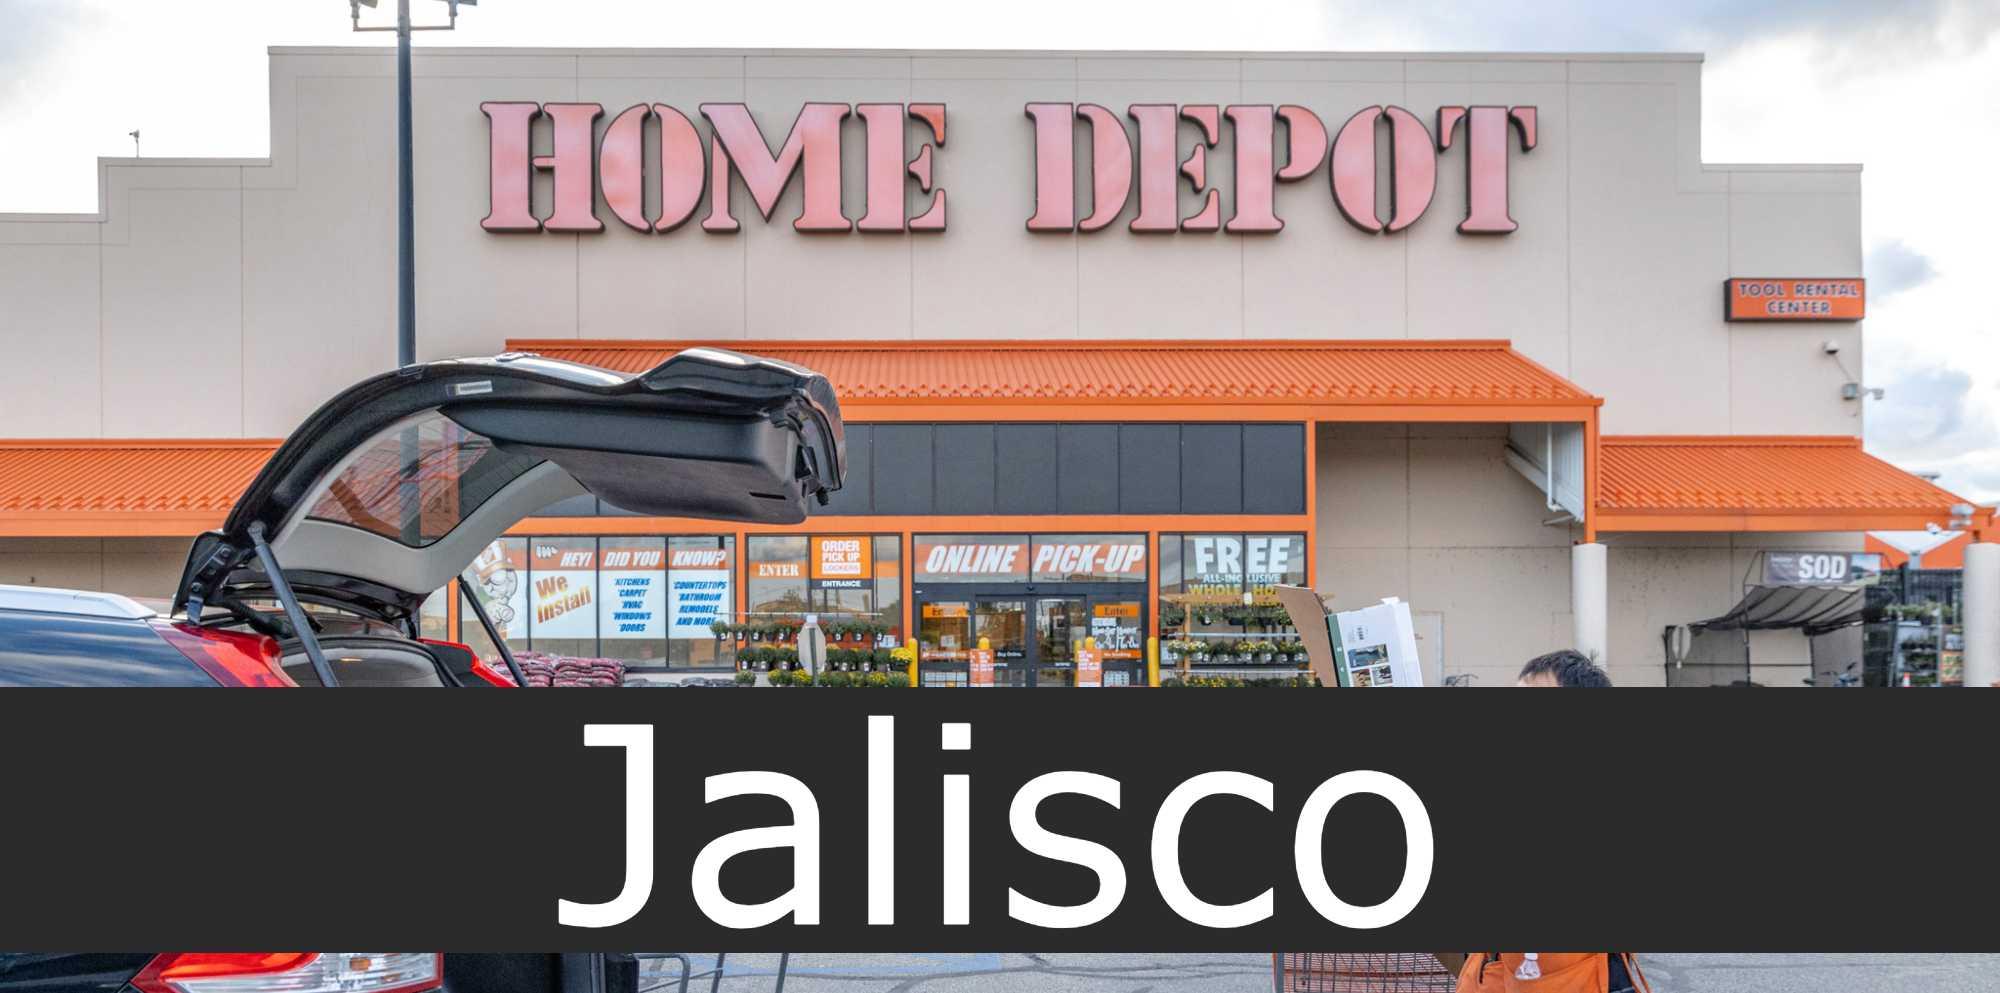 home depot Jalisco